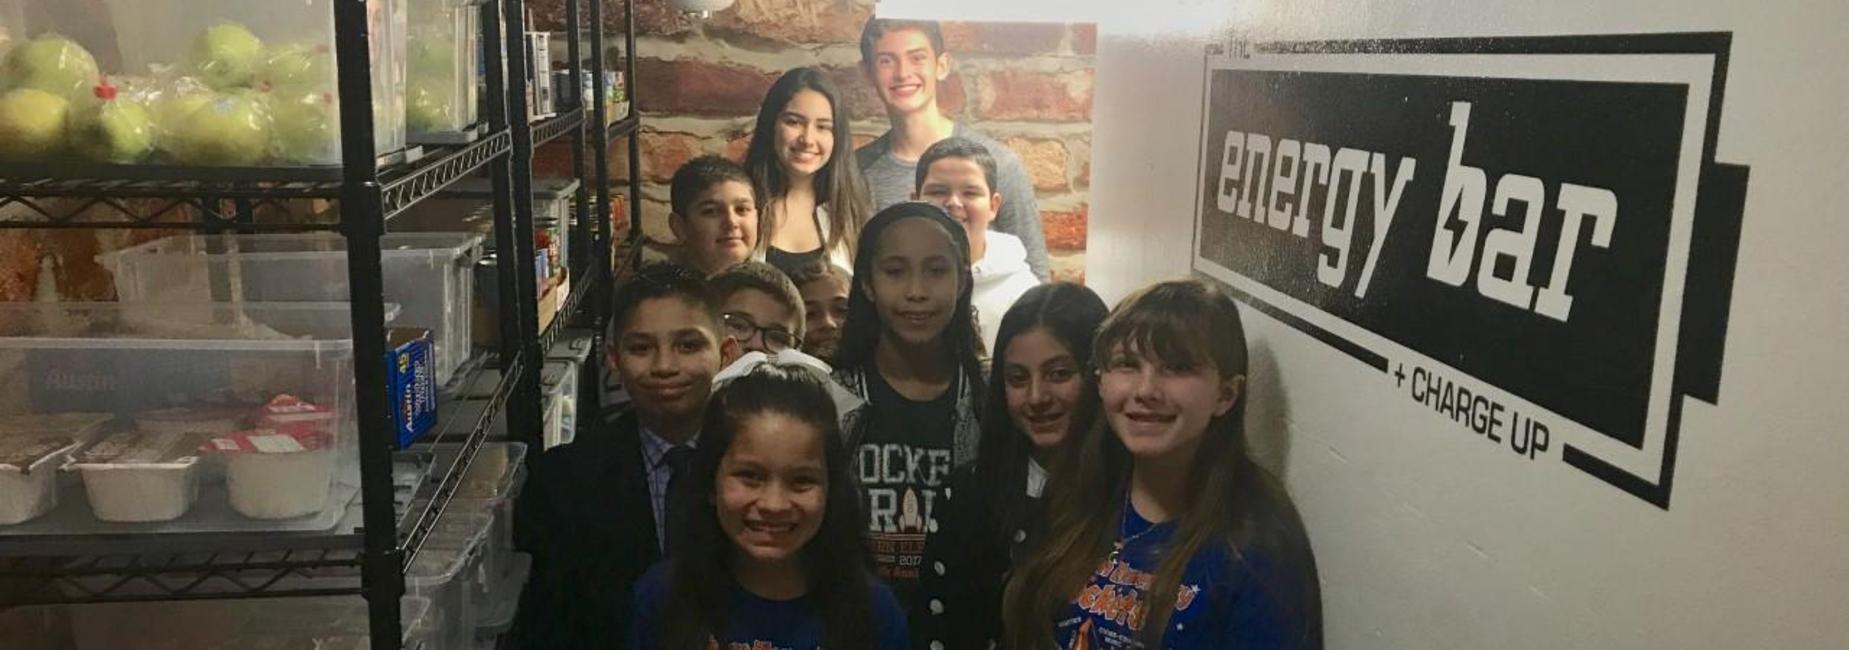 Rayburn students visit pantry